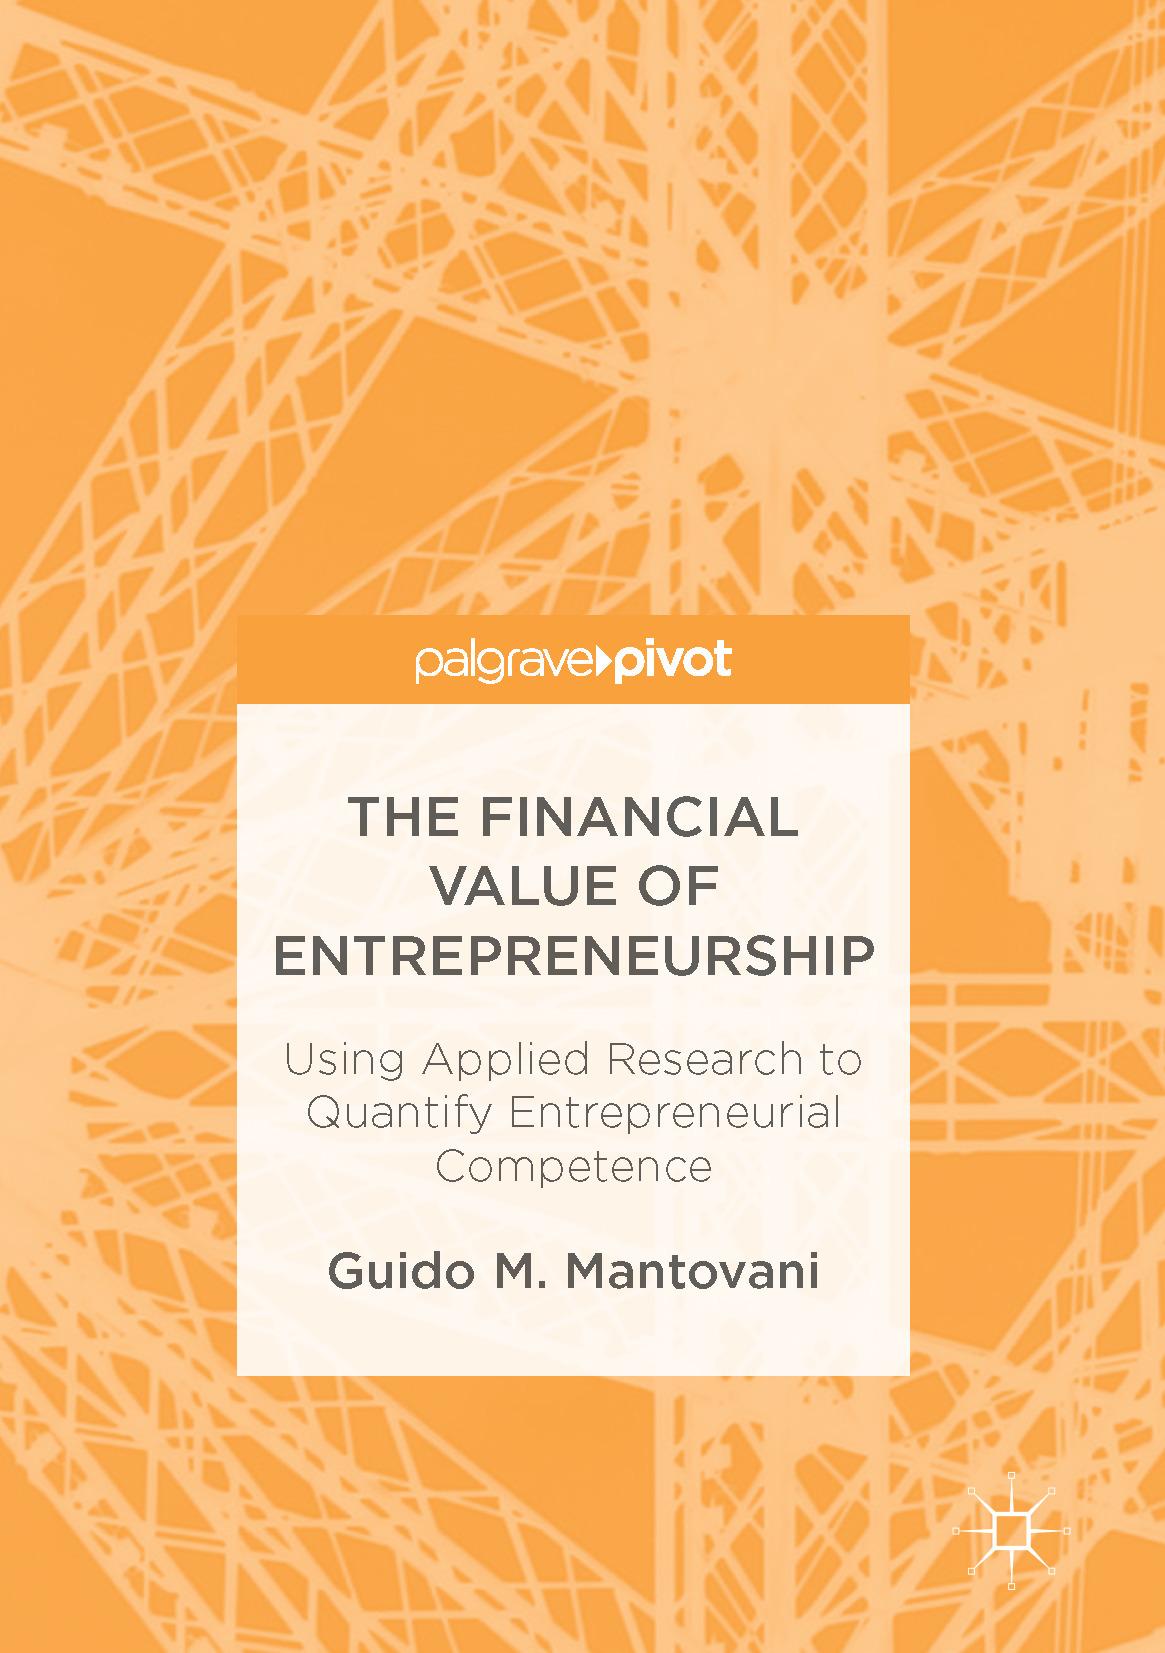 Mantovani, Guido M. - The Financial Value of Entrepreneurship, ebook